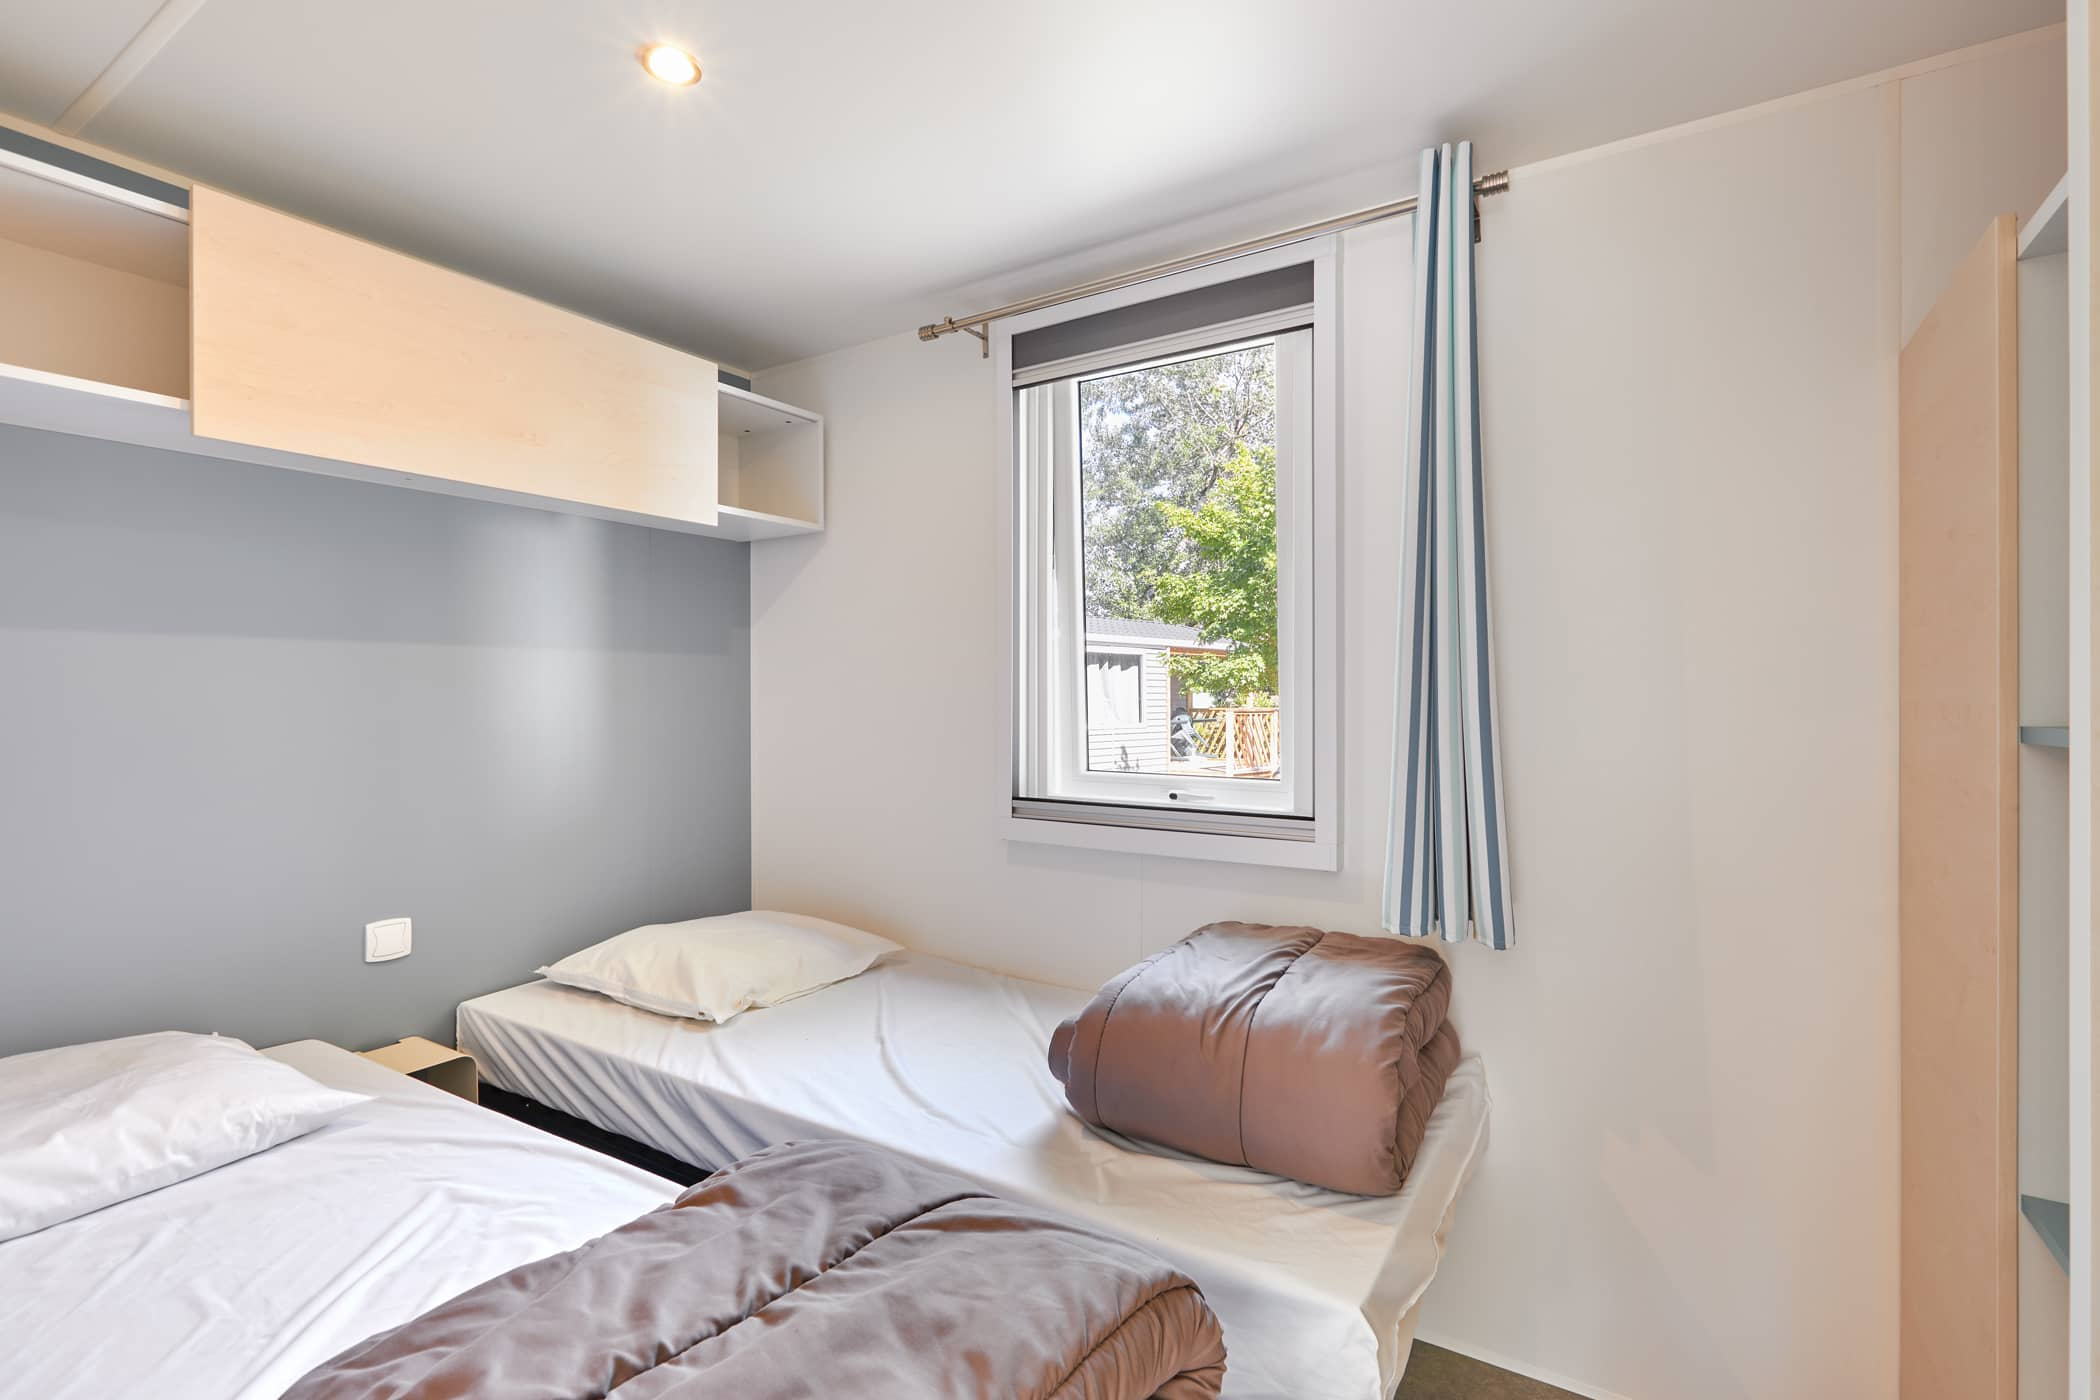 chambre lits jumeaux mobil-home proche La Rochelle